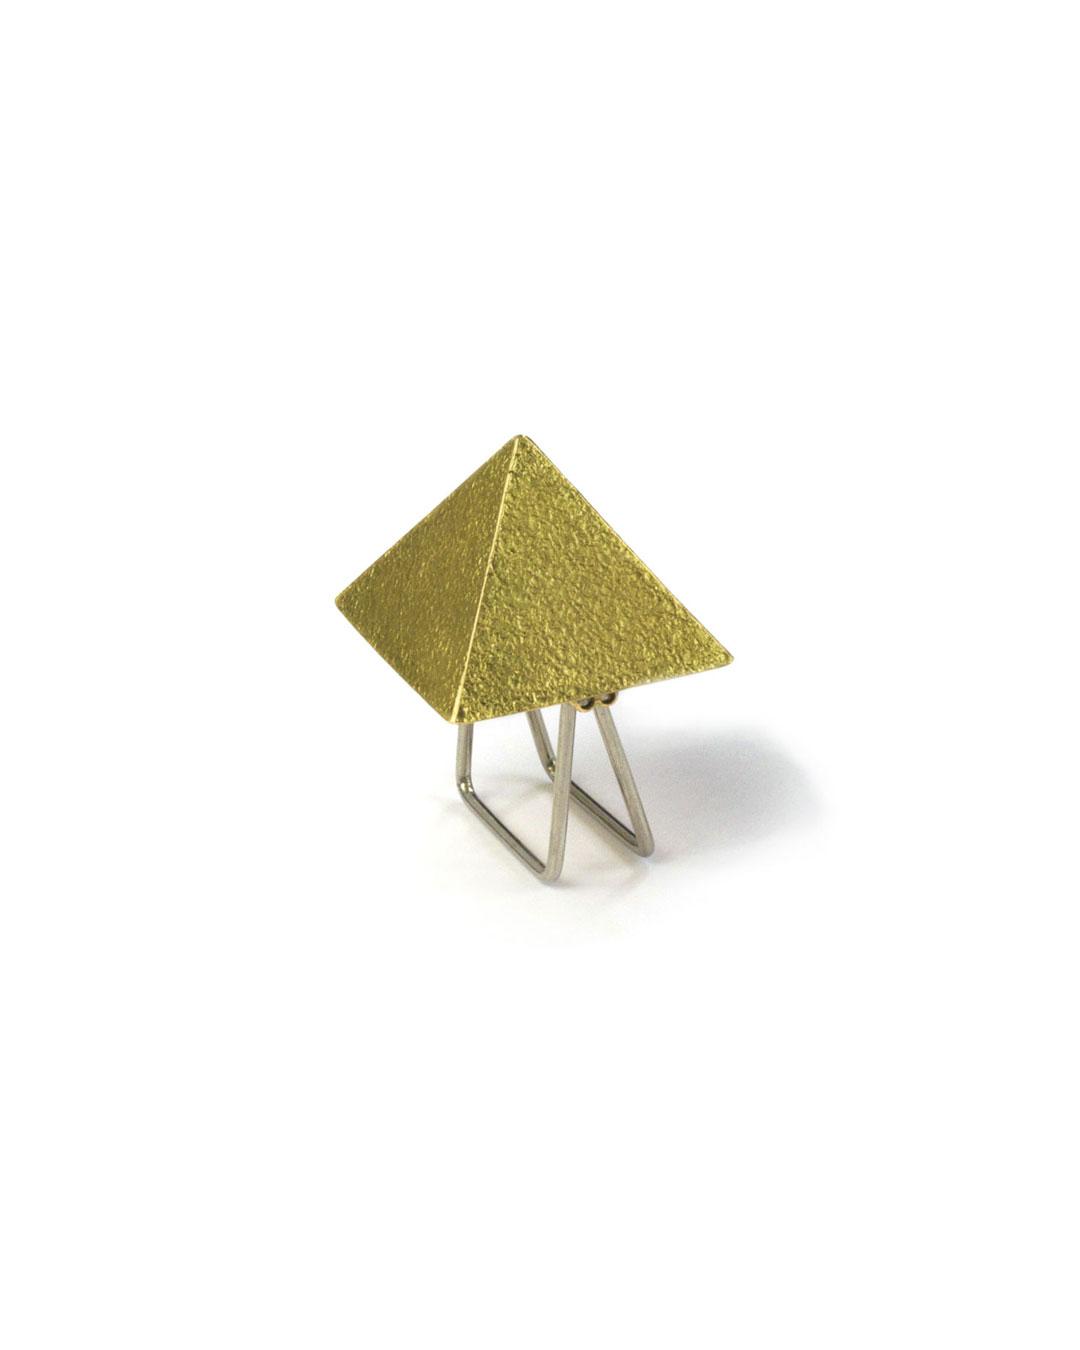 Okinari Kurokawa, untitled, 2007, ring; 20ct gold, 29 x 23 x 12 mm, €1600